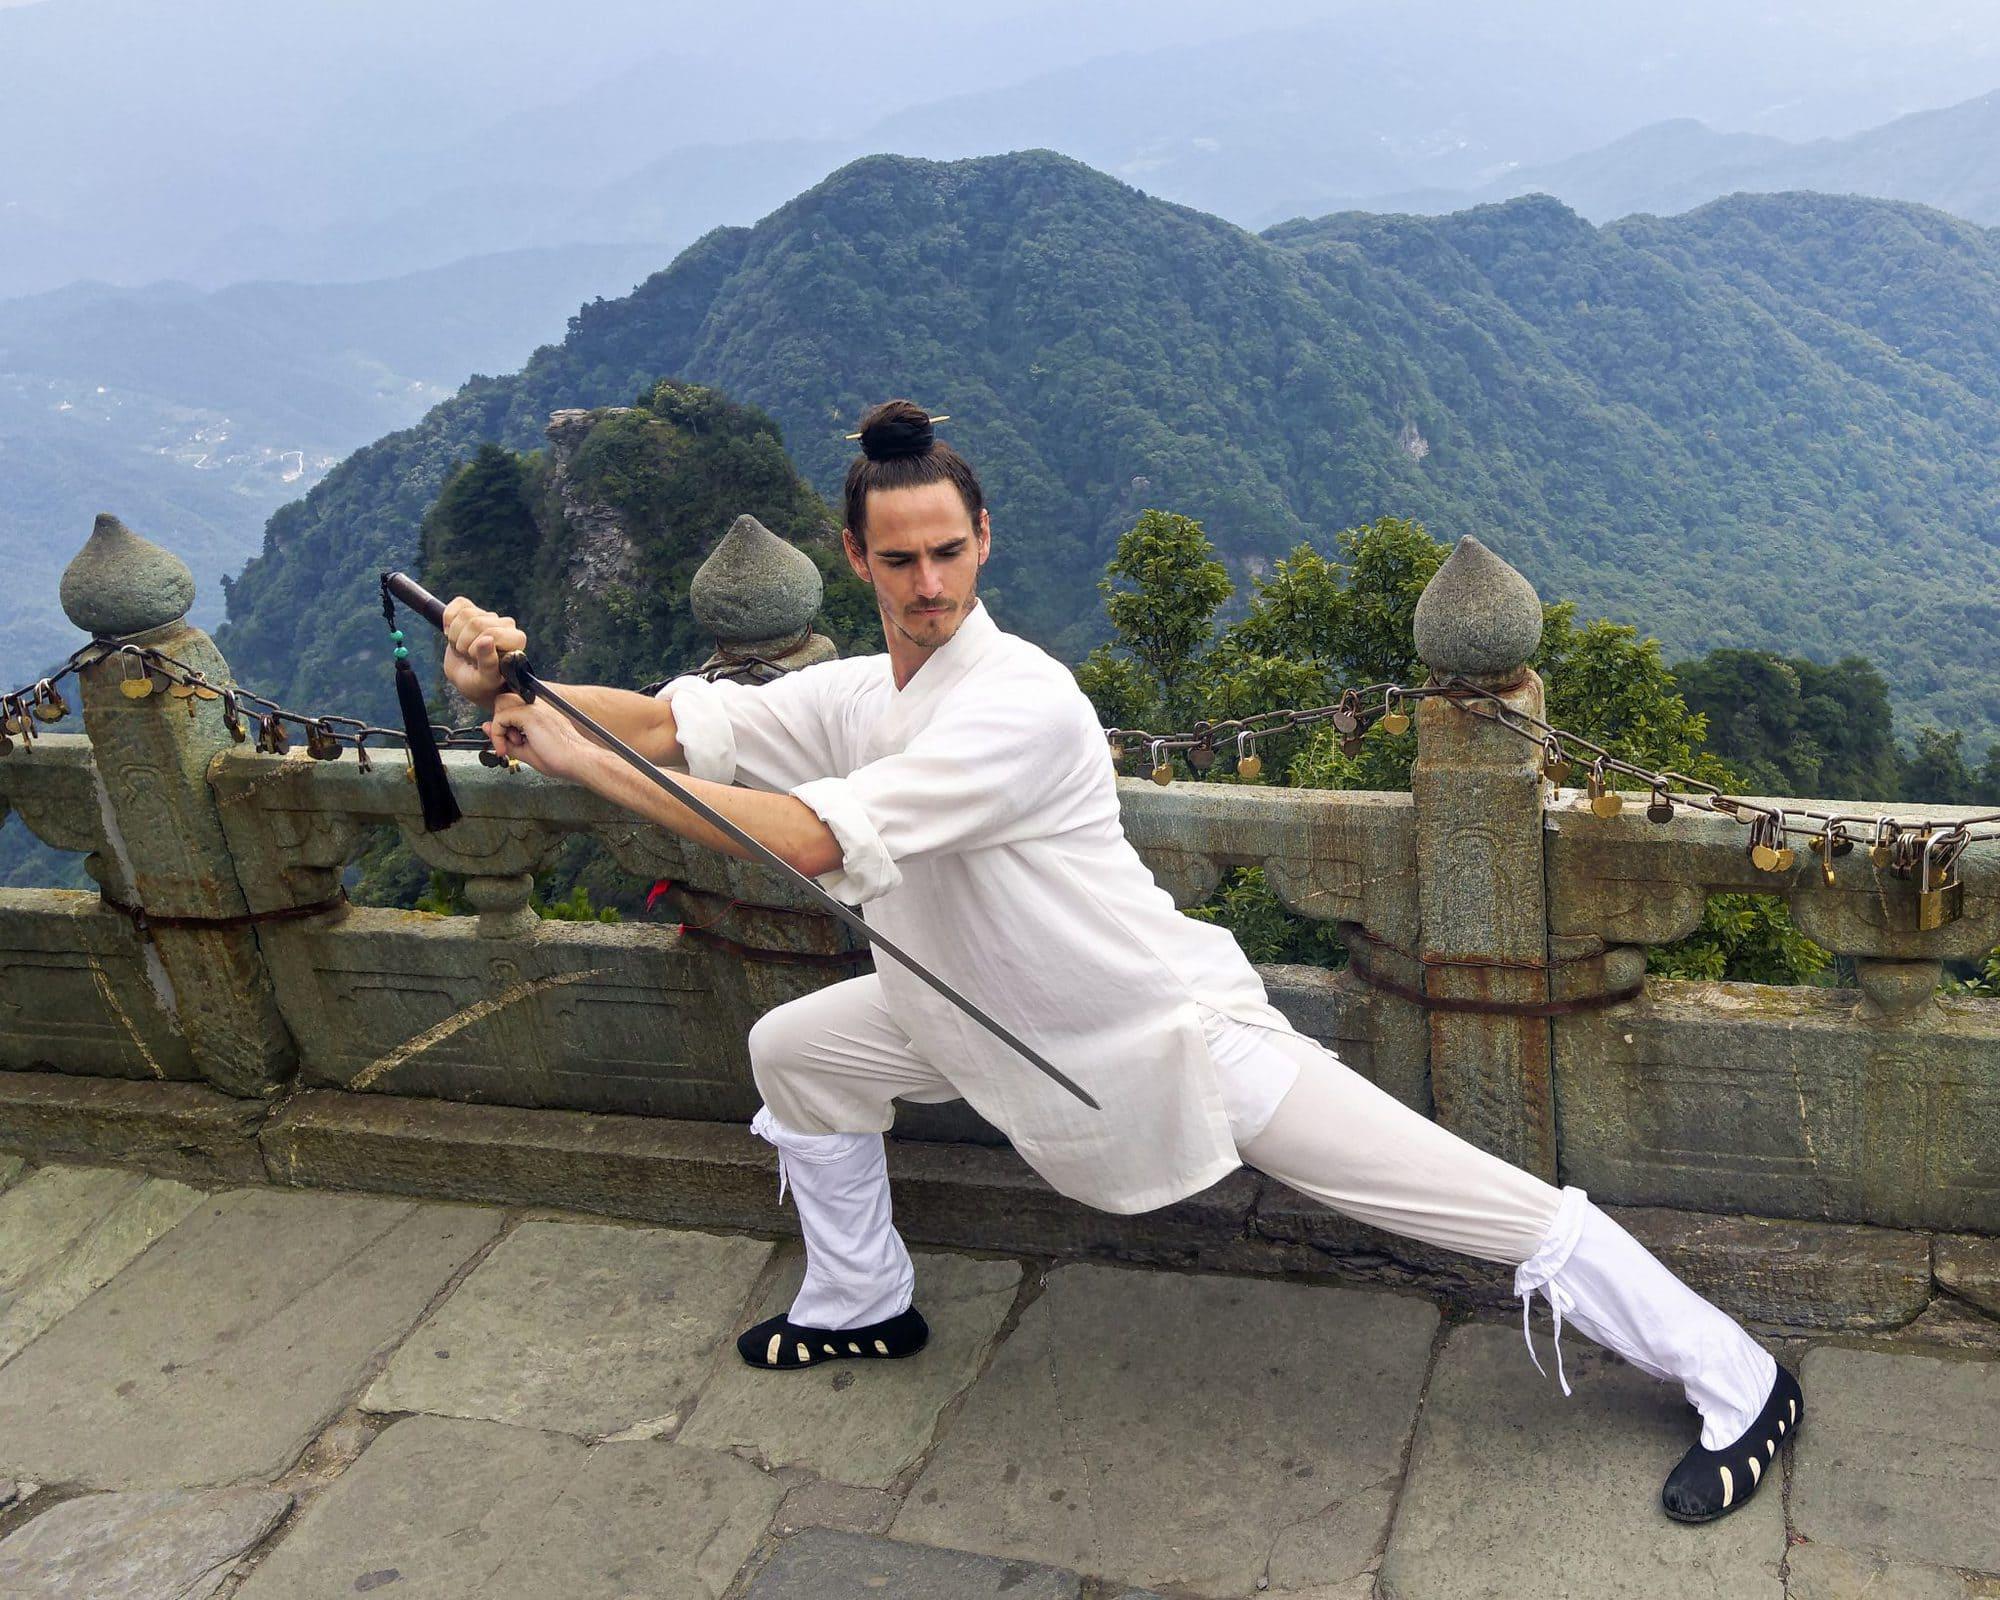 The Wudang Sword Art